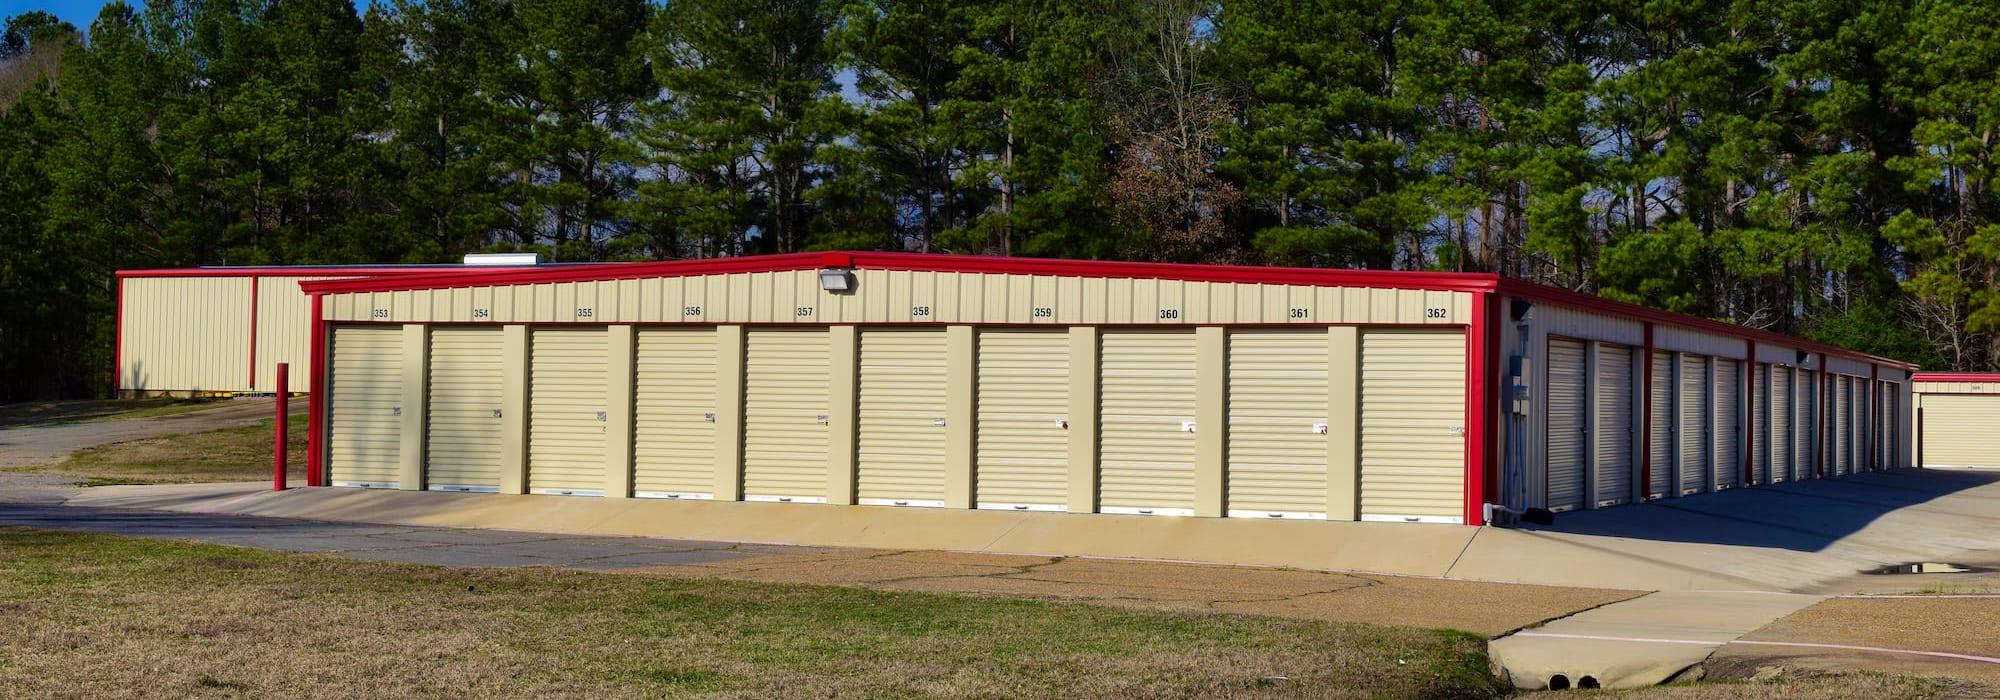 Storage units at Lockaway Storage in Texarkana, Texas